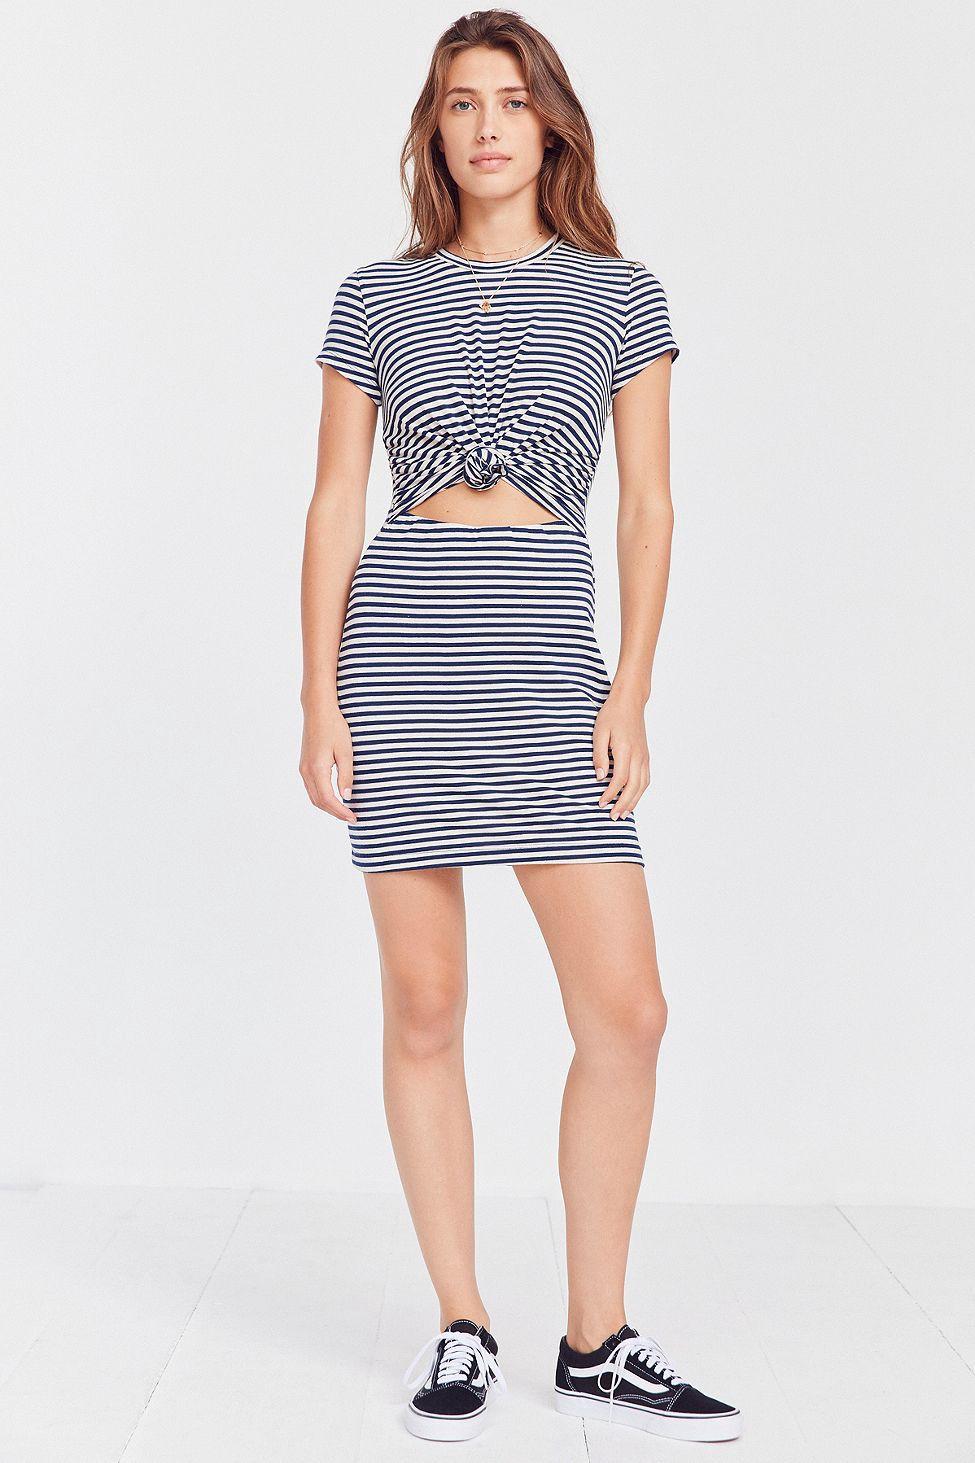 60ac2de68a7 Urban Outfitters Silence + Noise Knotted T-Shirt Dress - XL